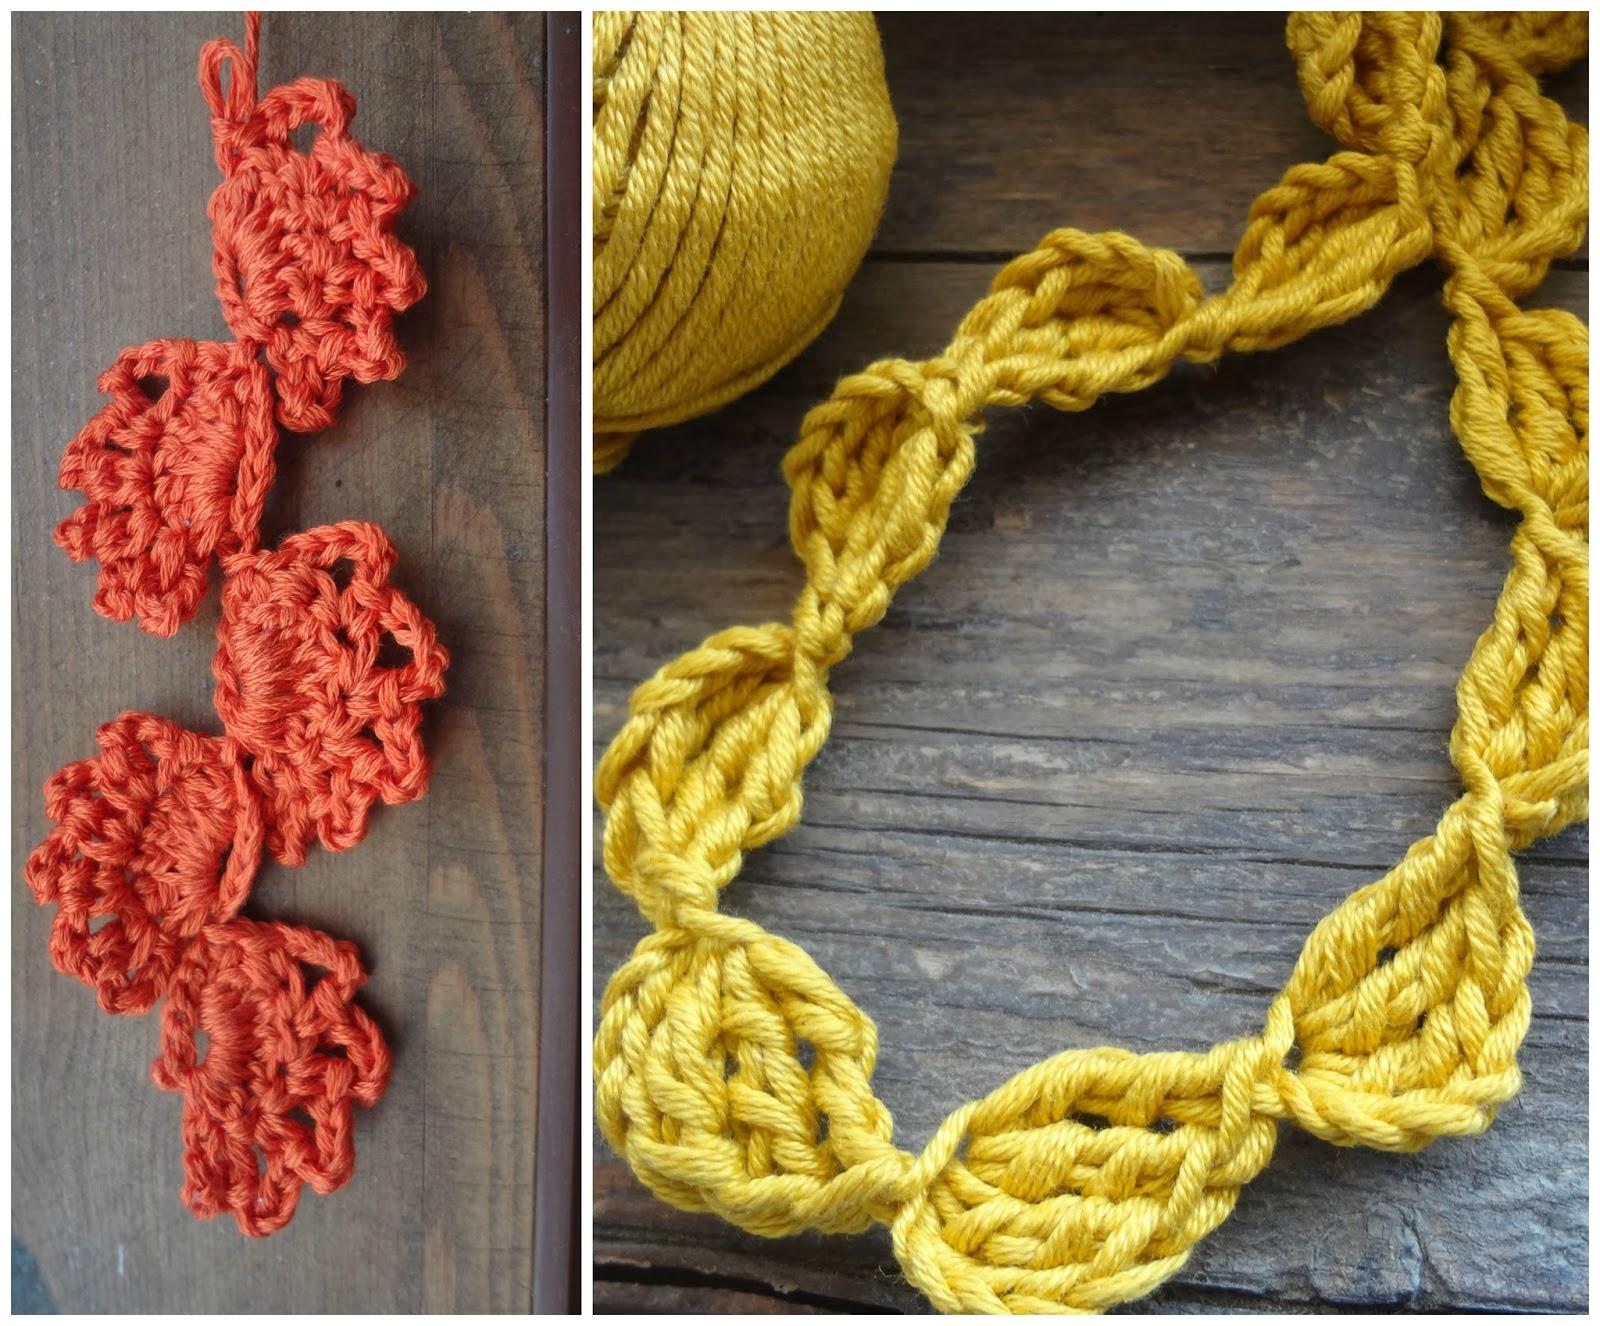 Little Treasures: Crochet Bohemian Patterns